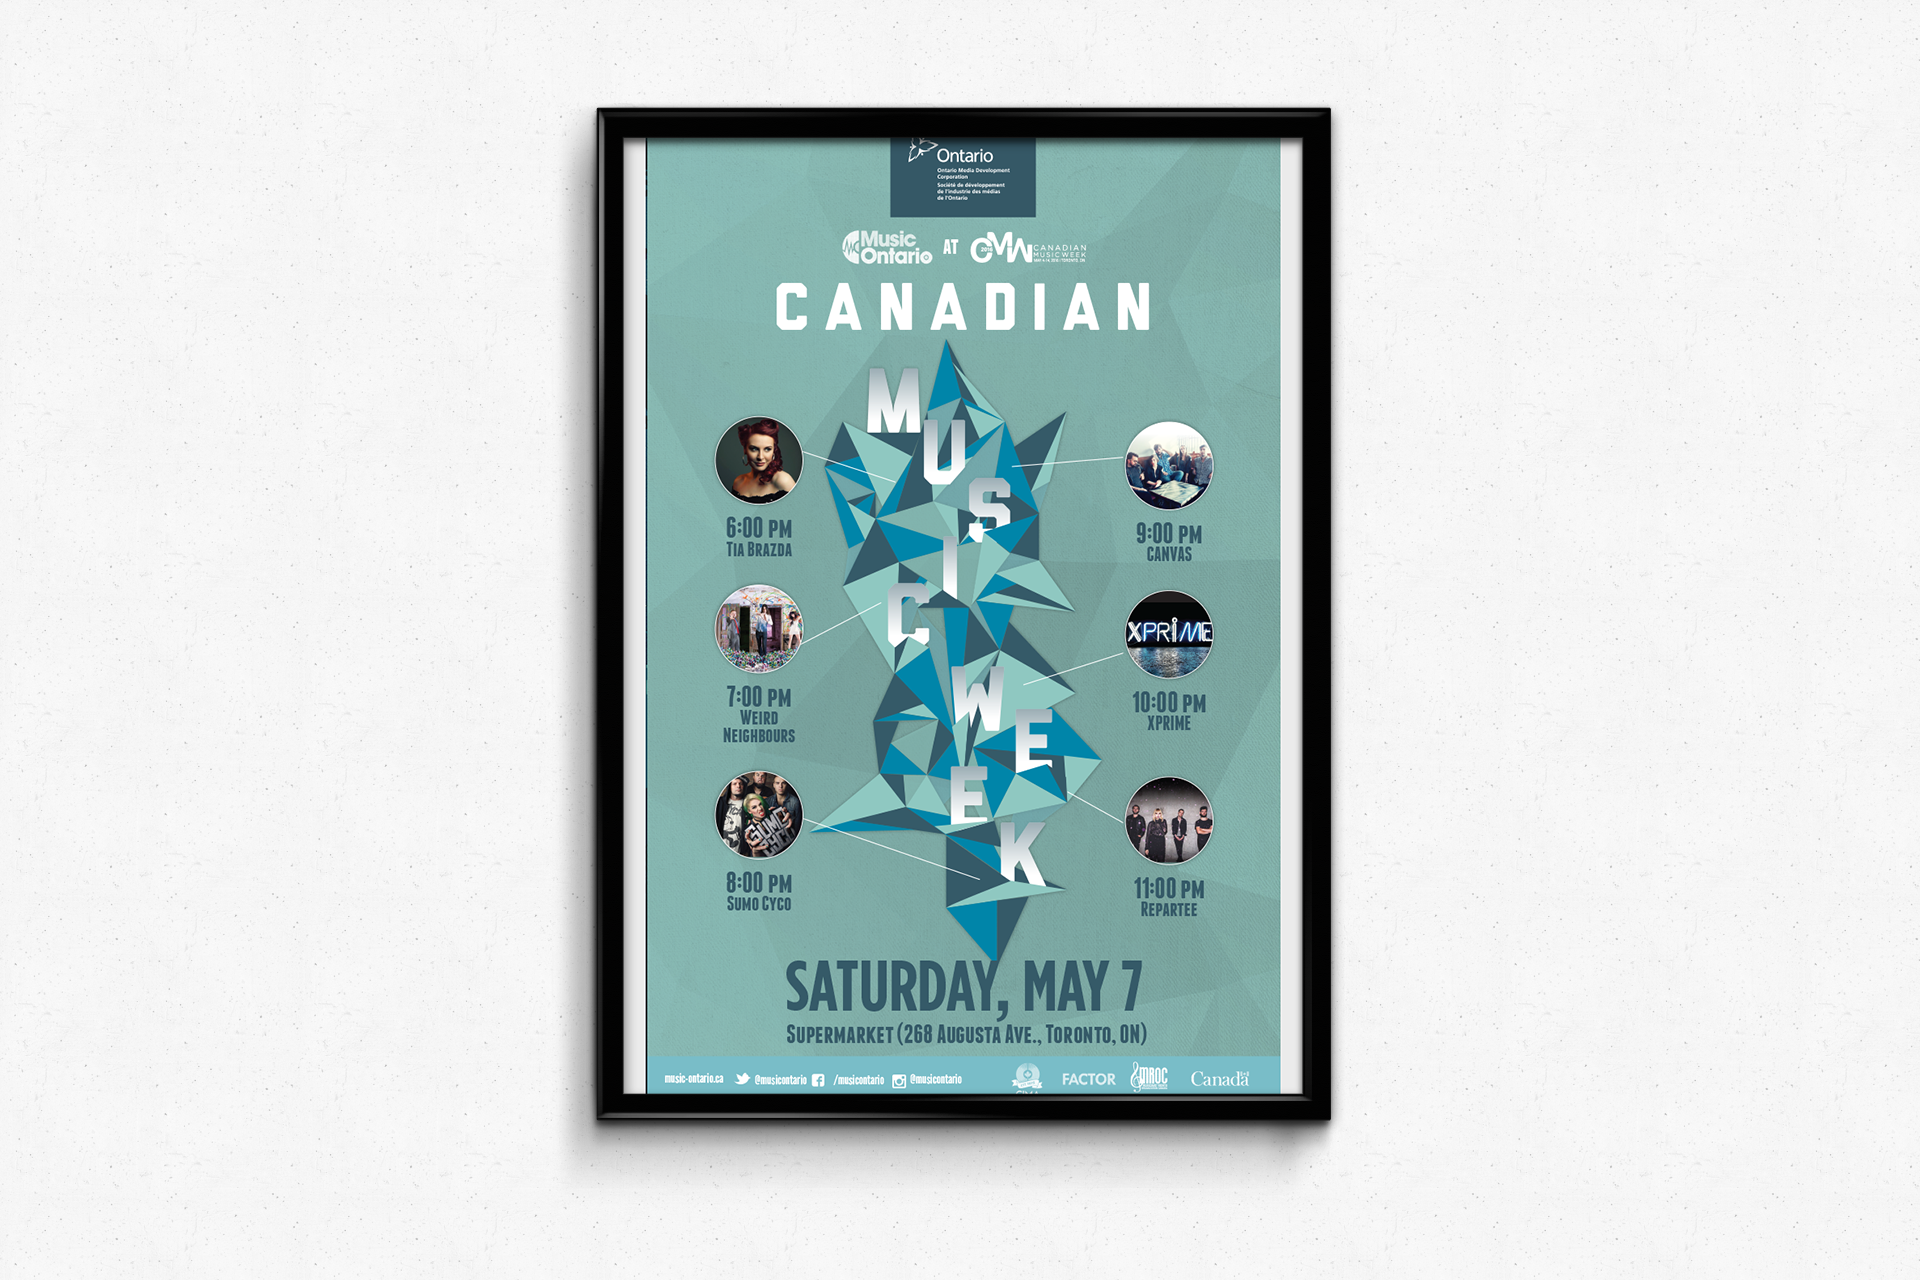 MusicOntario — Canadian Music Week